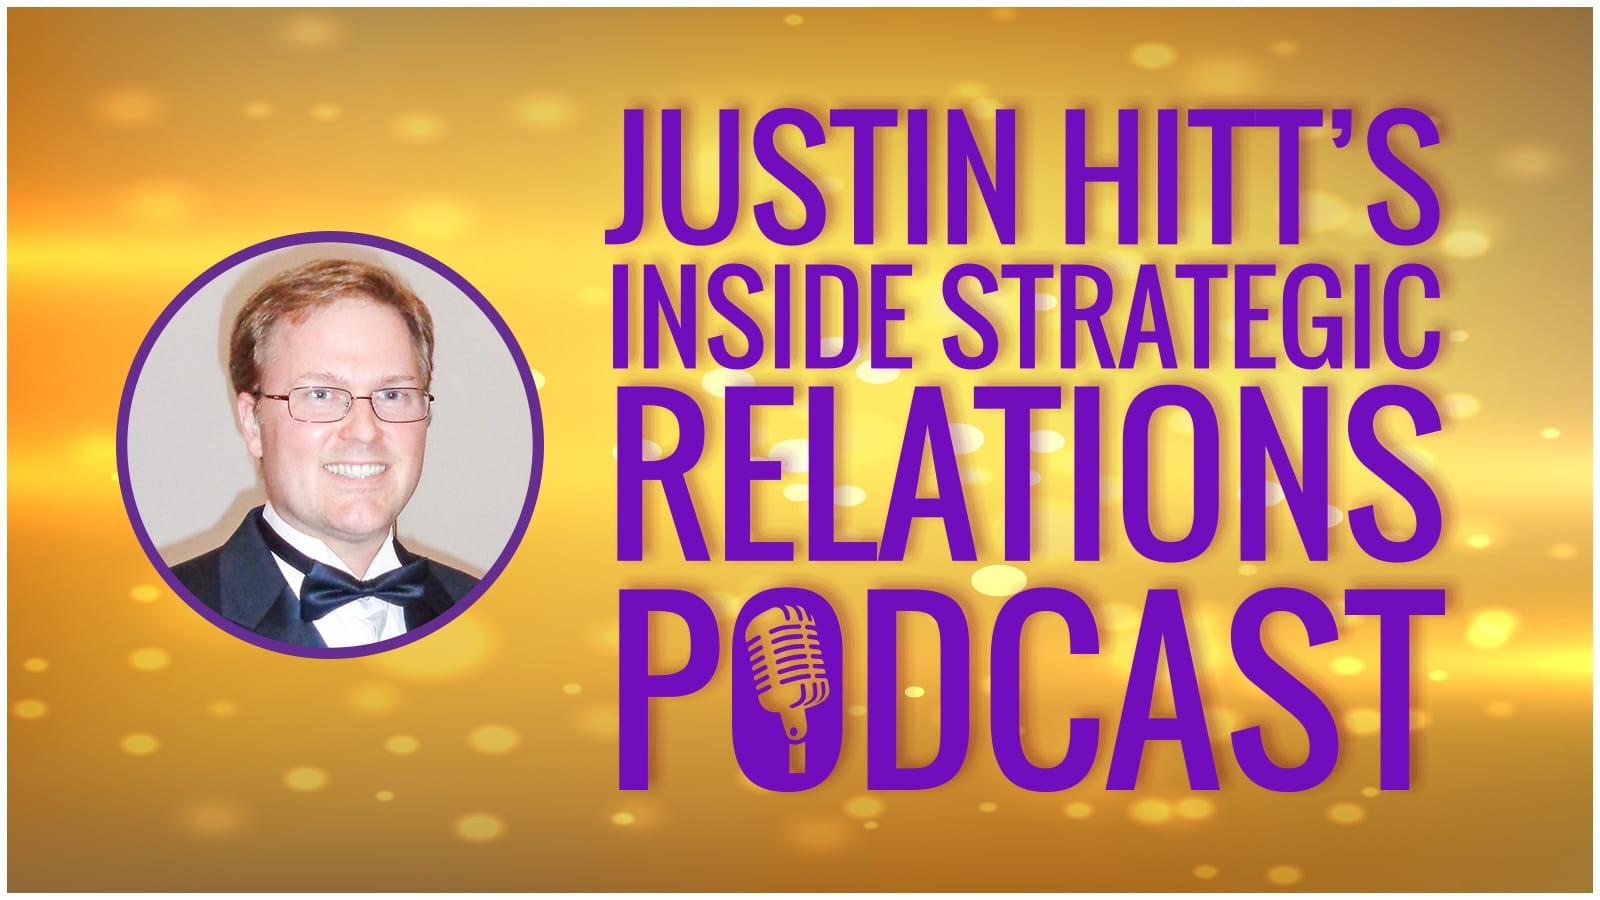 Logo, Justin Hitt's Inside Strategic Relations Podcast